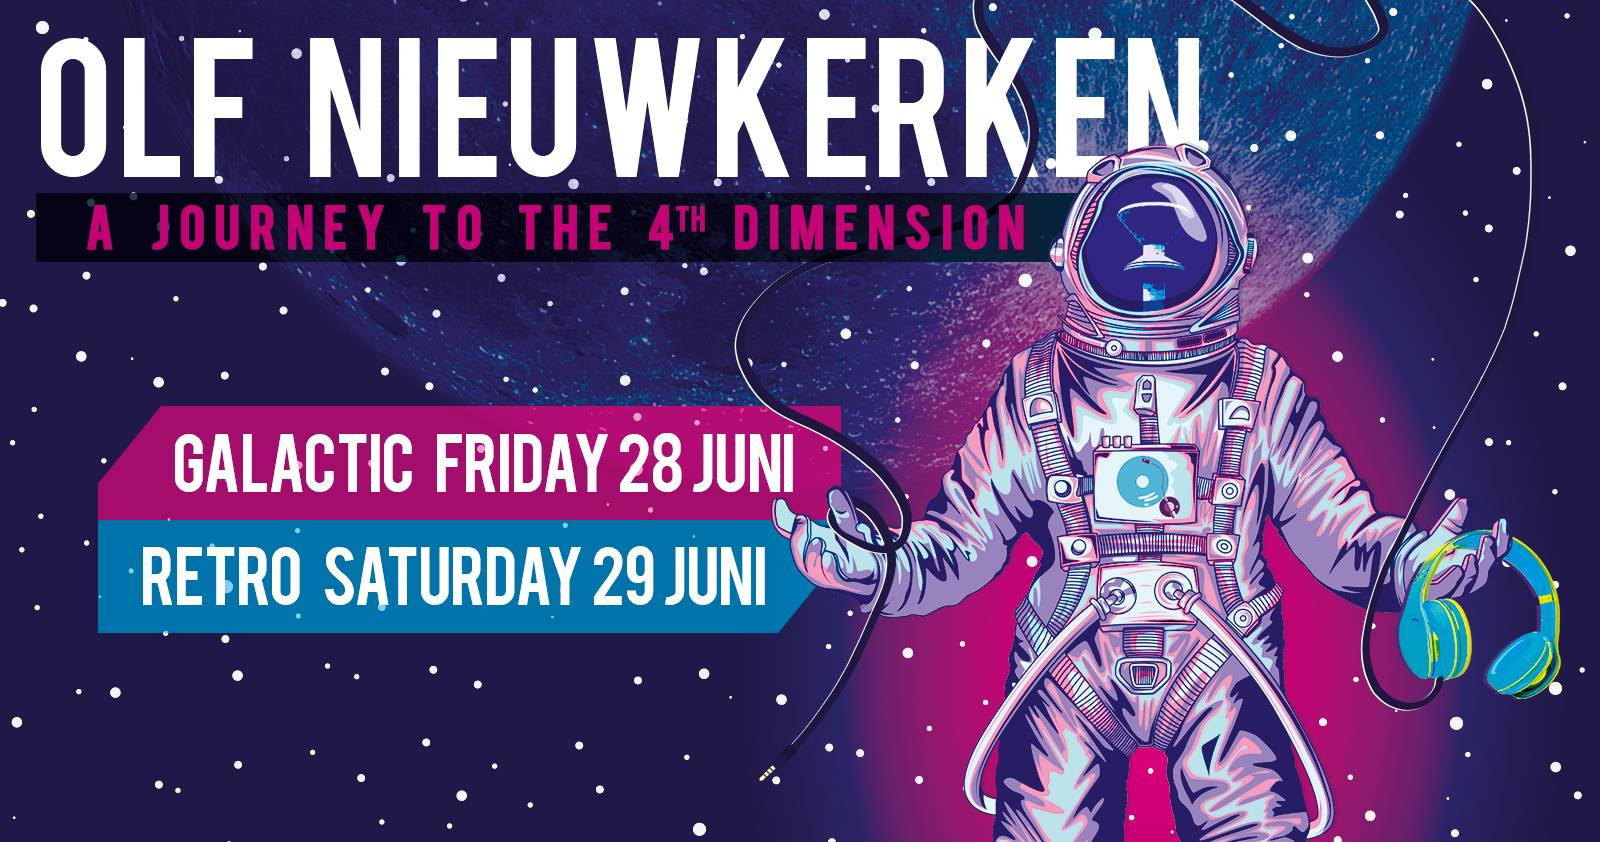 OLF Nieuwkerken 2019